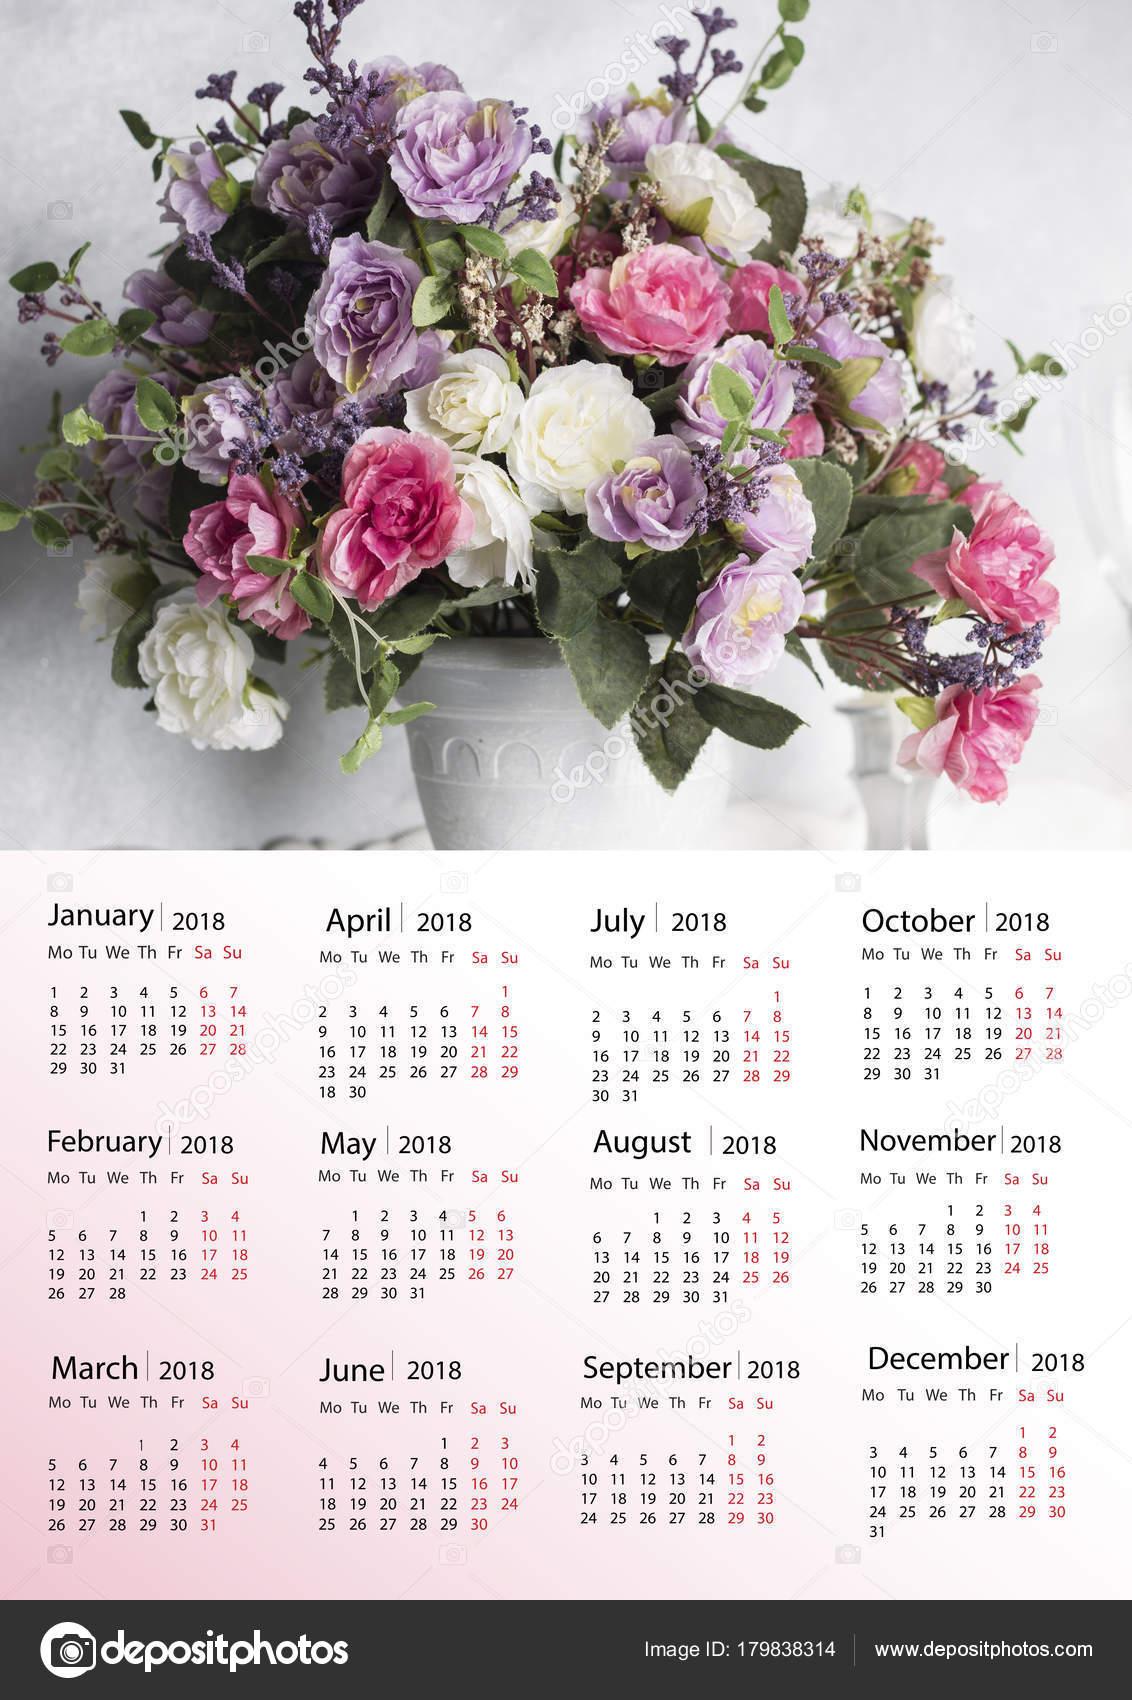 Beautiful Flowers Vase Calendar 2018 New Year Stock Photo